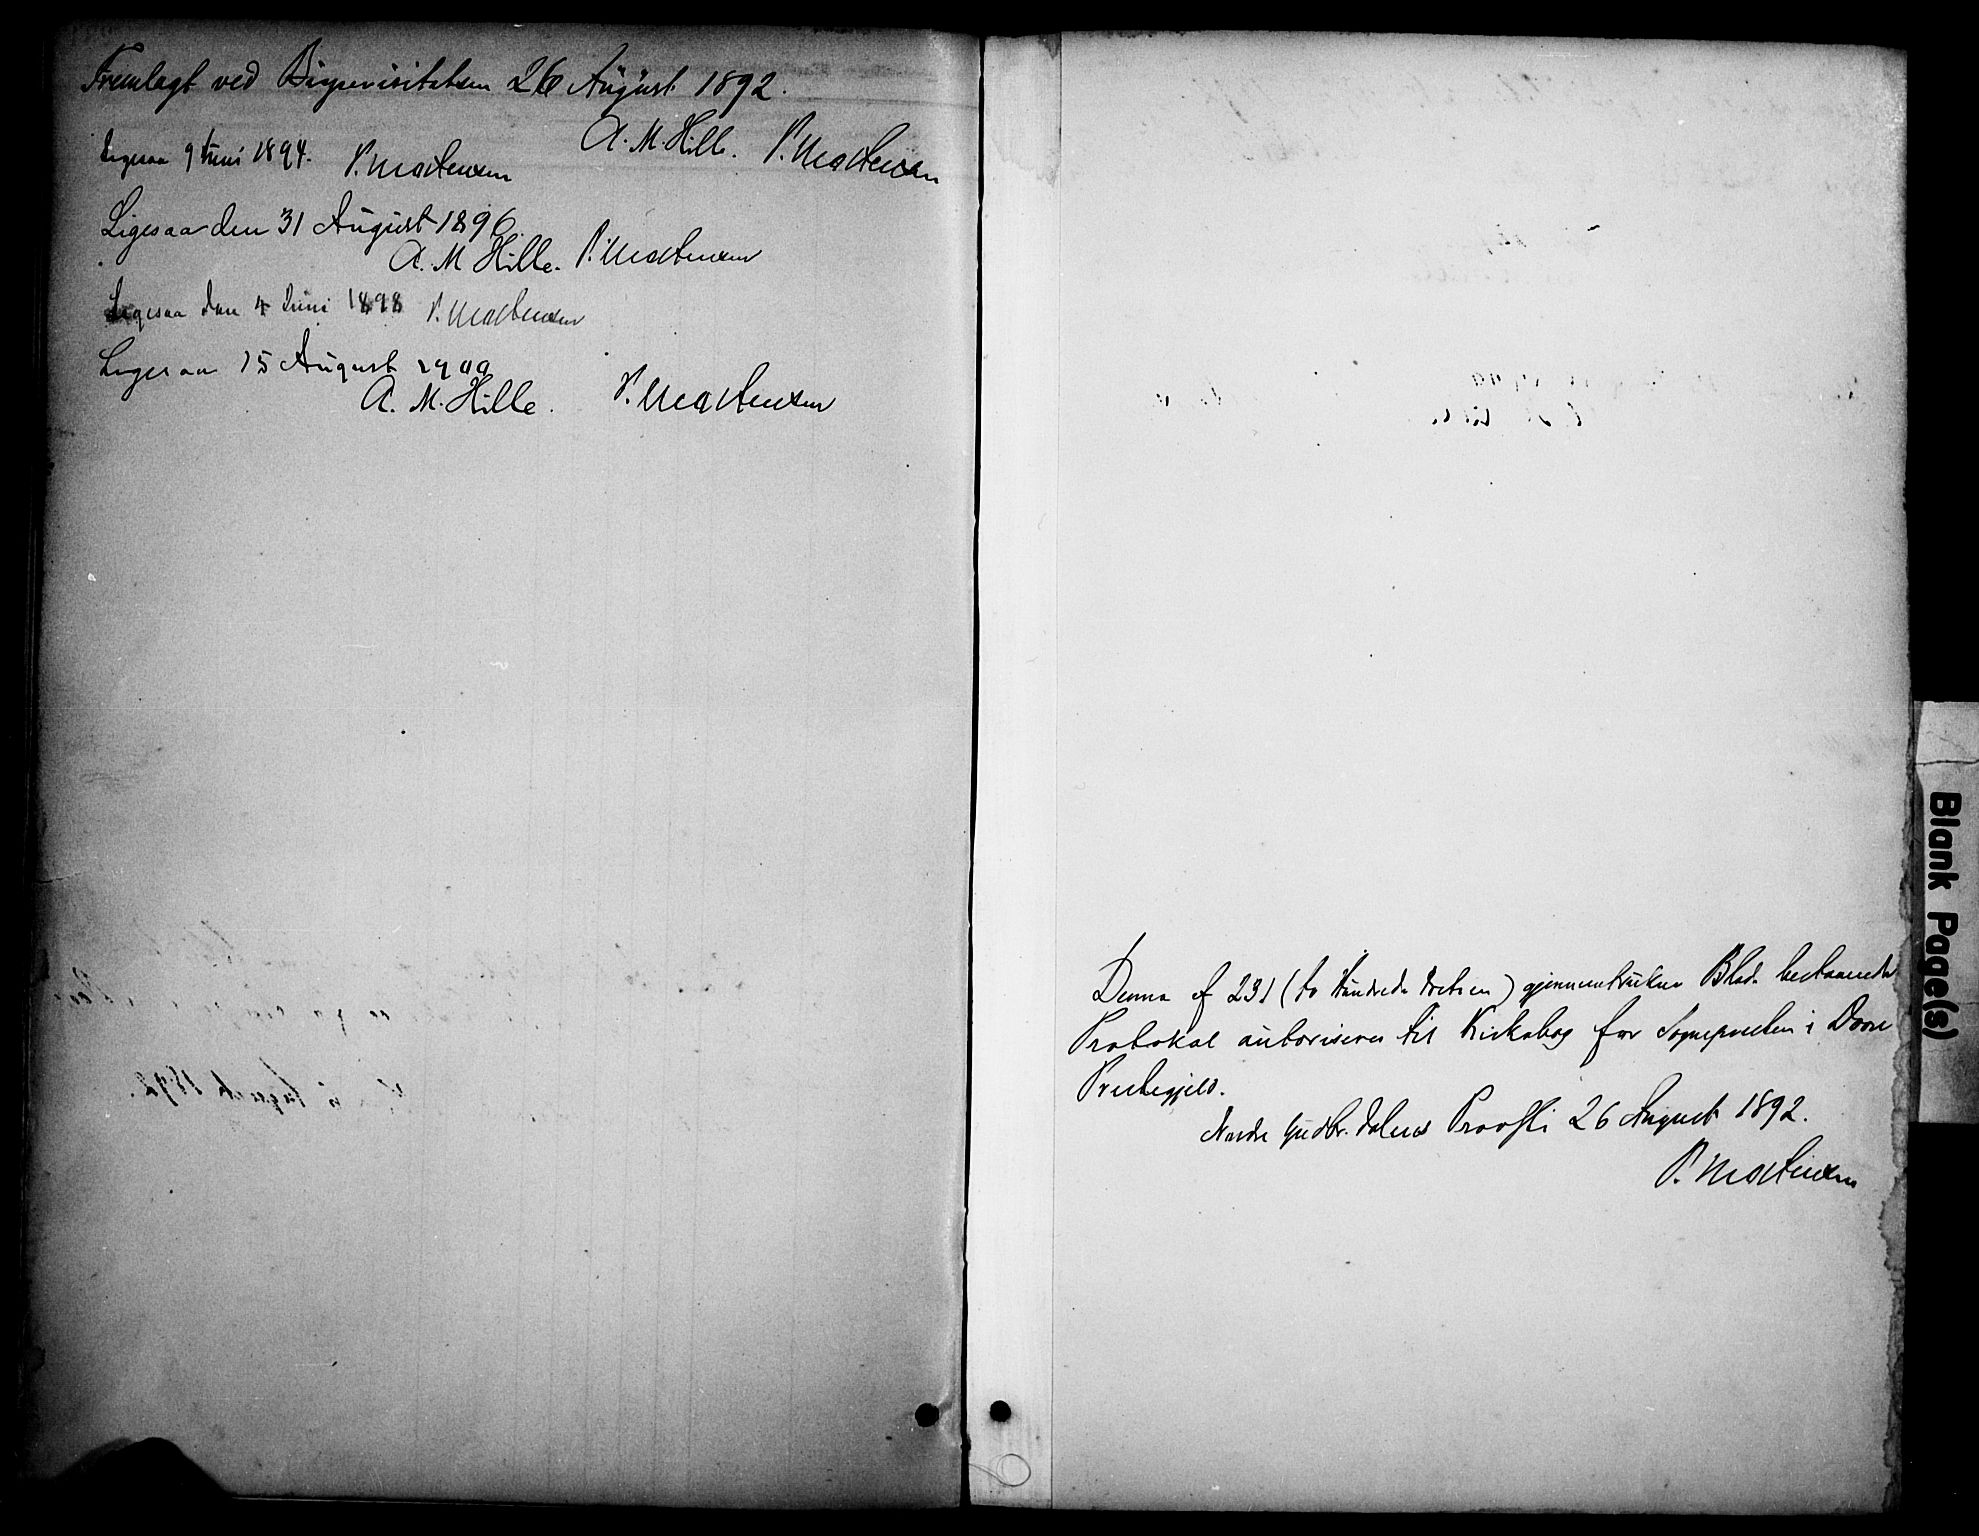 SAH, Dovre prestekontor, Ministerialbok nr. 3, 1891-1901, s. 230